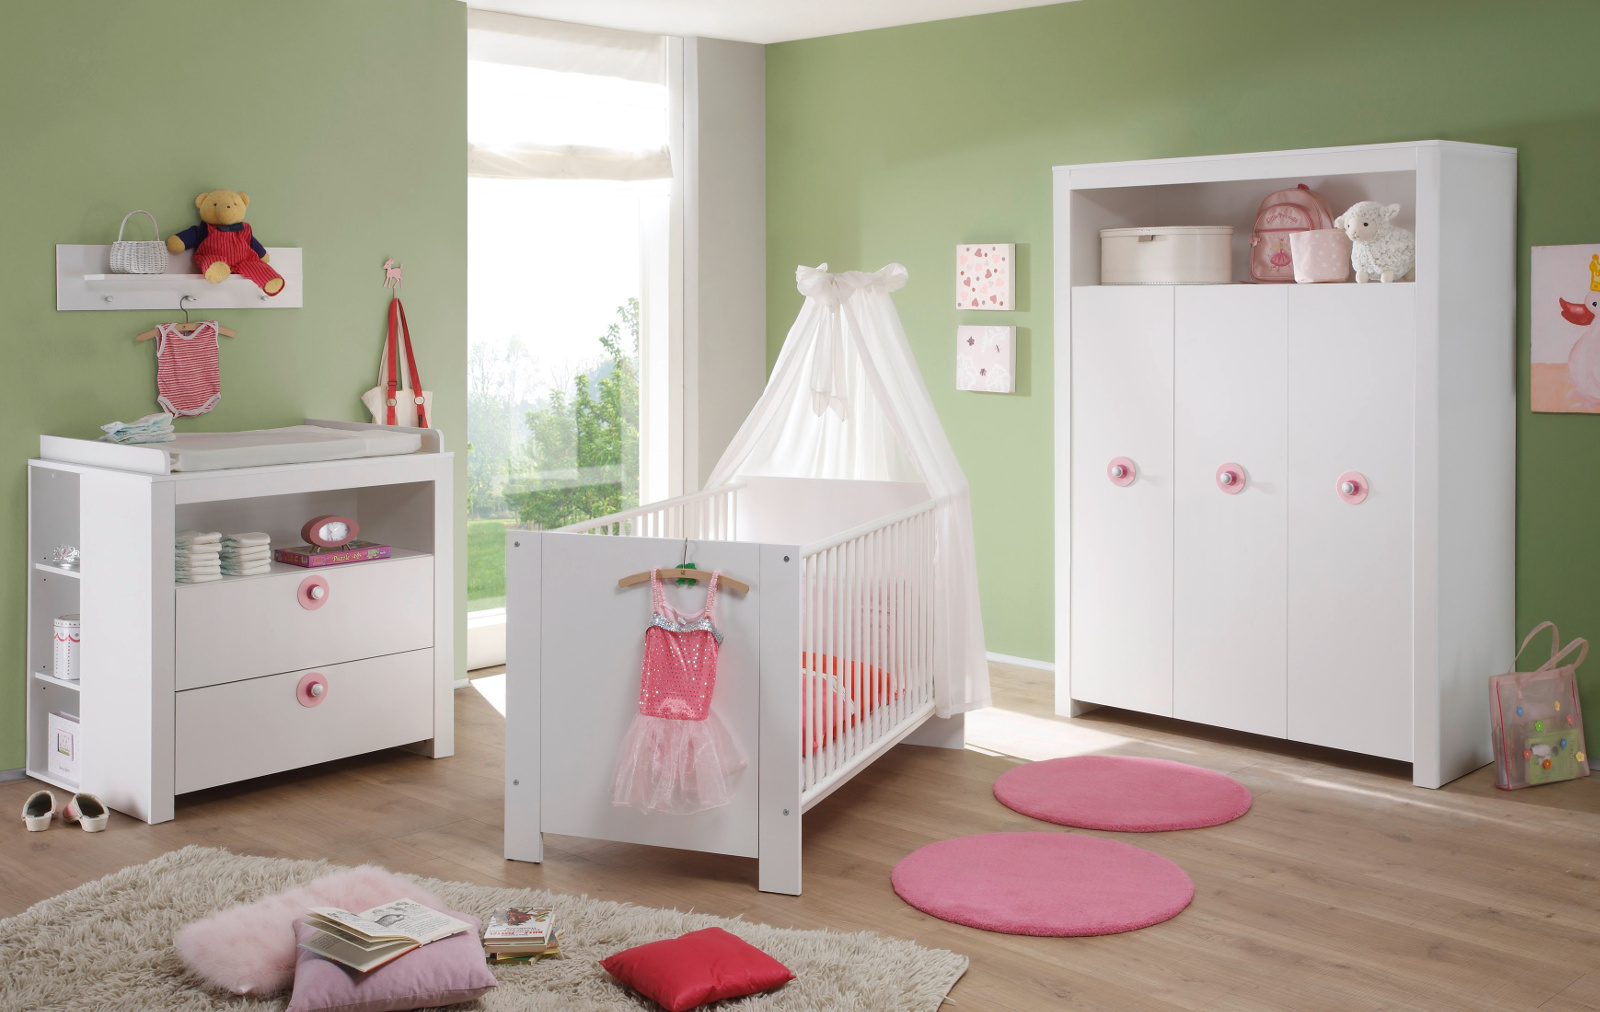 Wandregal Weis Kinderzimmer odette wandregal kinder massivwei gewachst Babyzimmer Wandregal Wandboard Olivia Wei 75 X 20 Cm